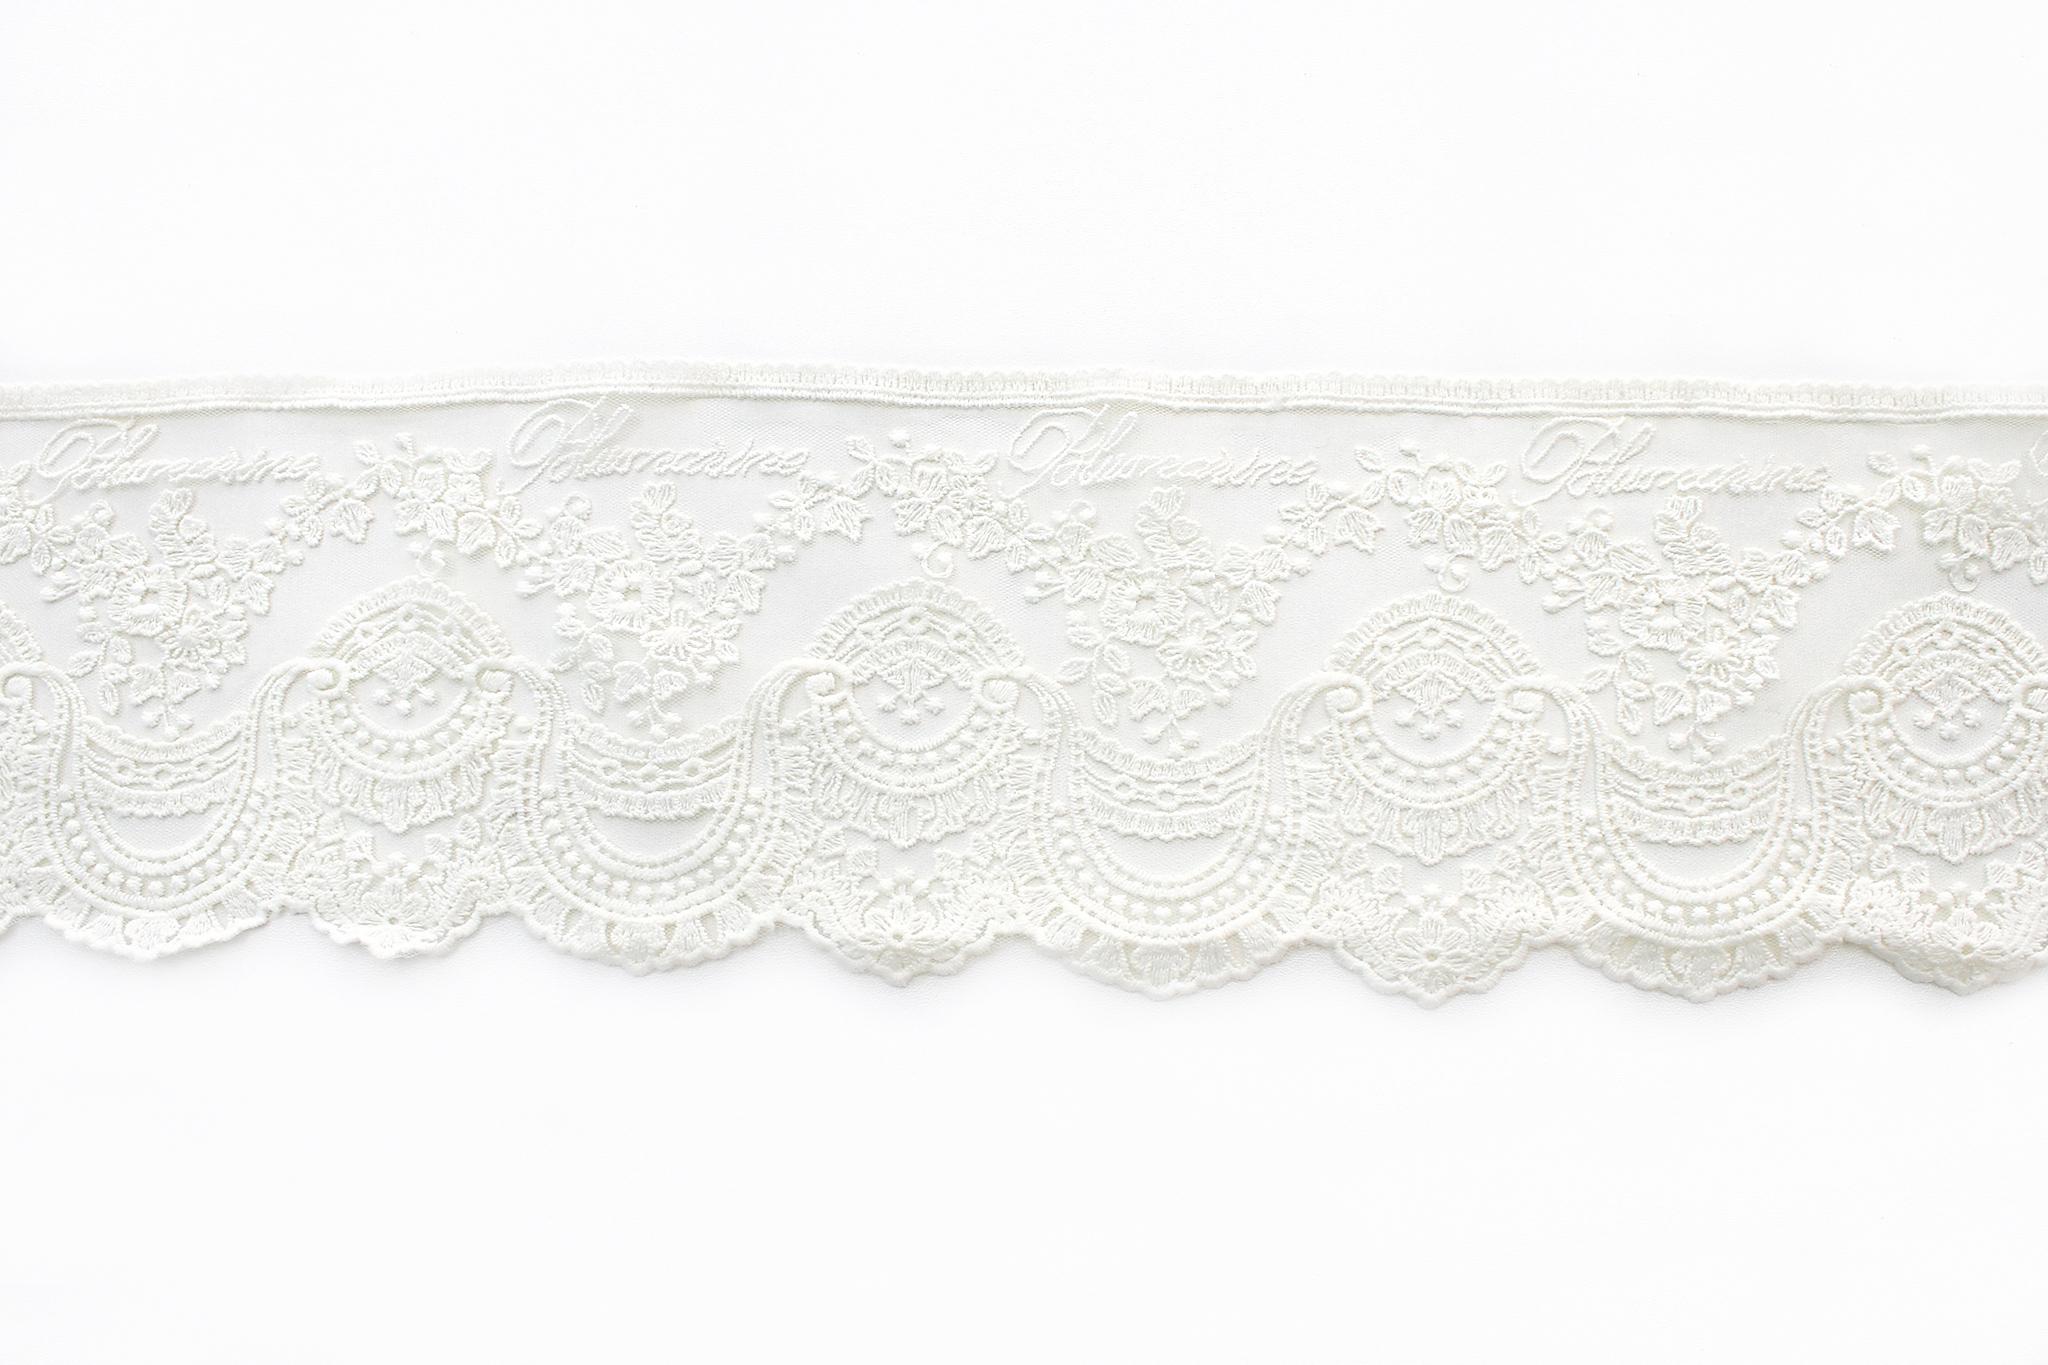 Кружево Blumarine(ваниль),11 см